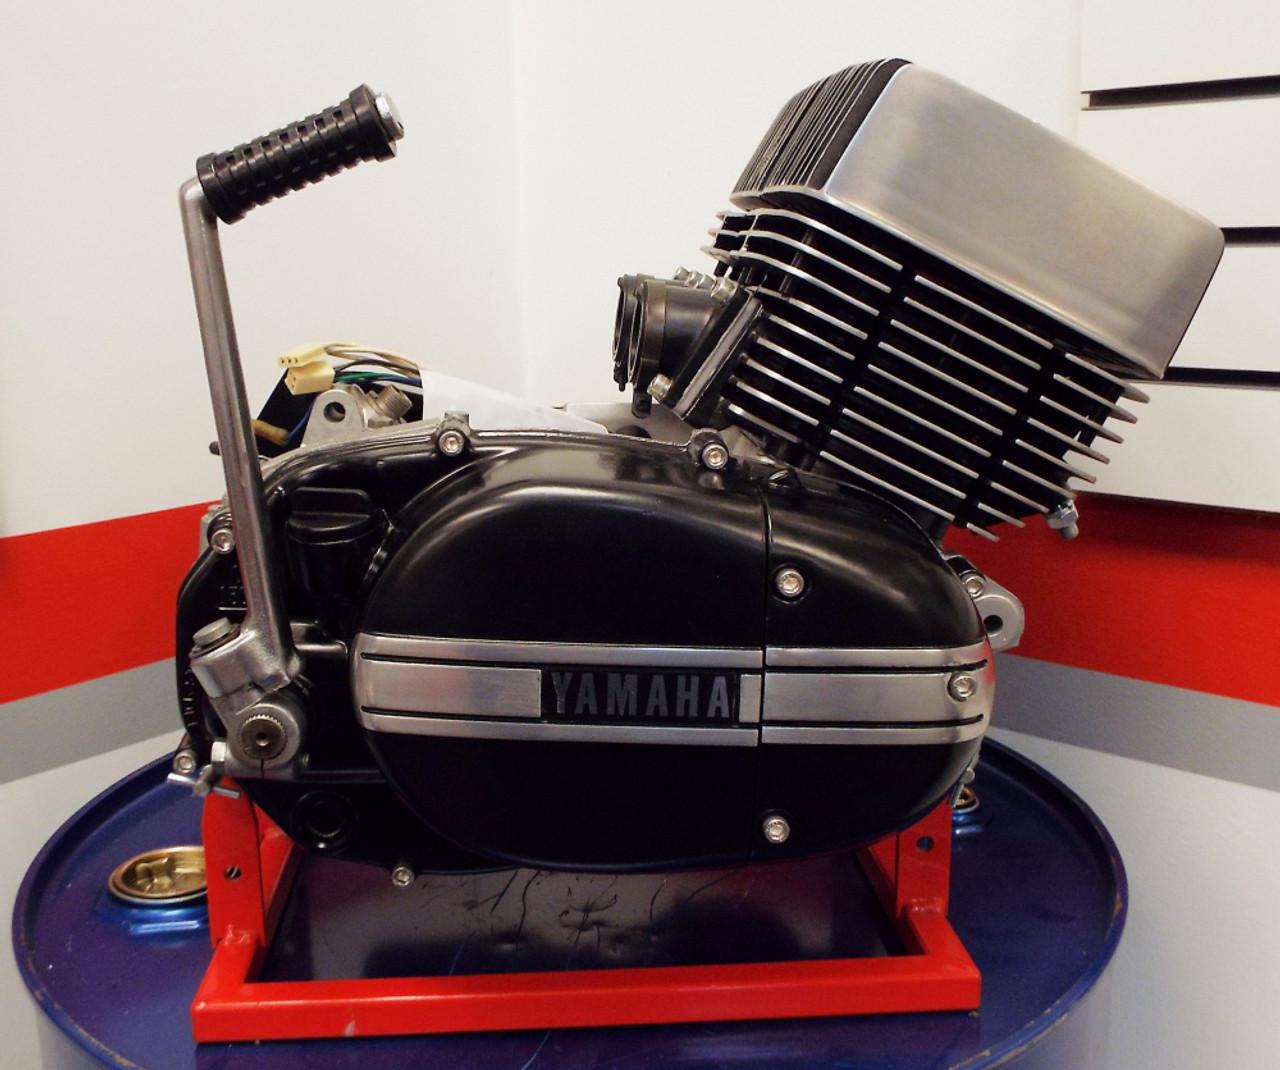 Yamaha RD250 Engine. 352-